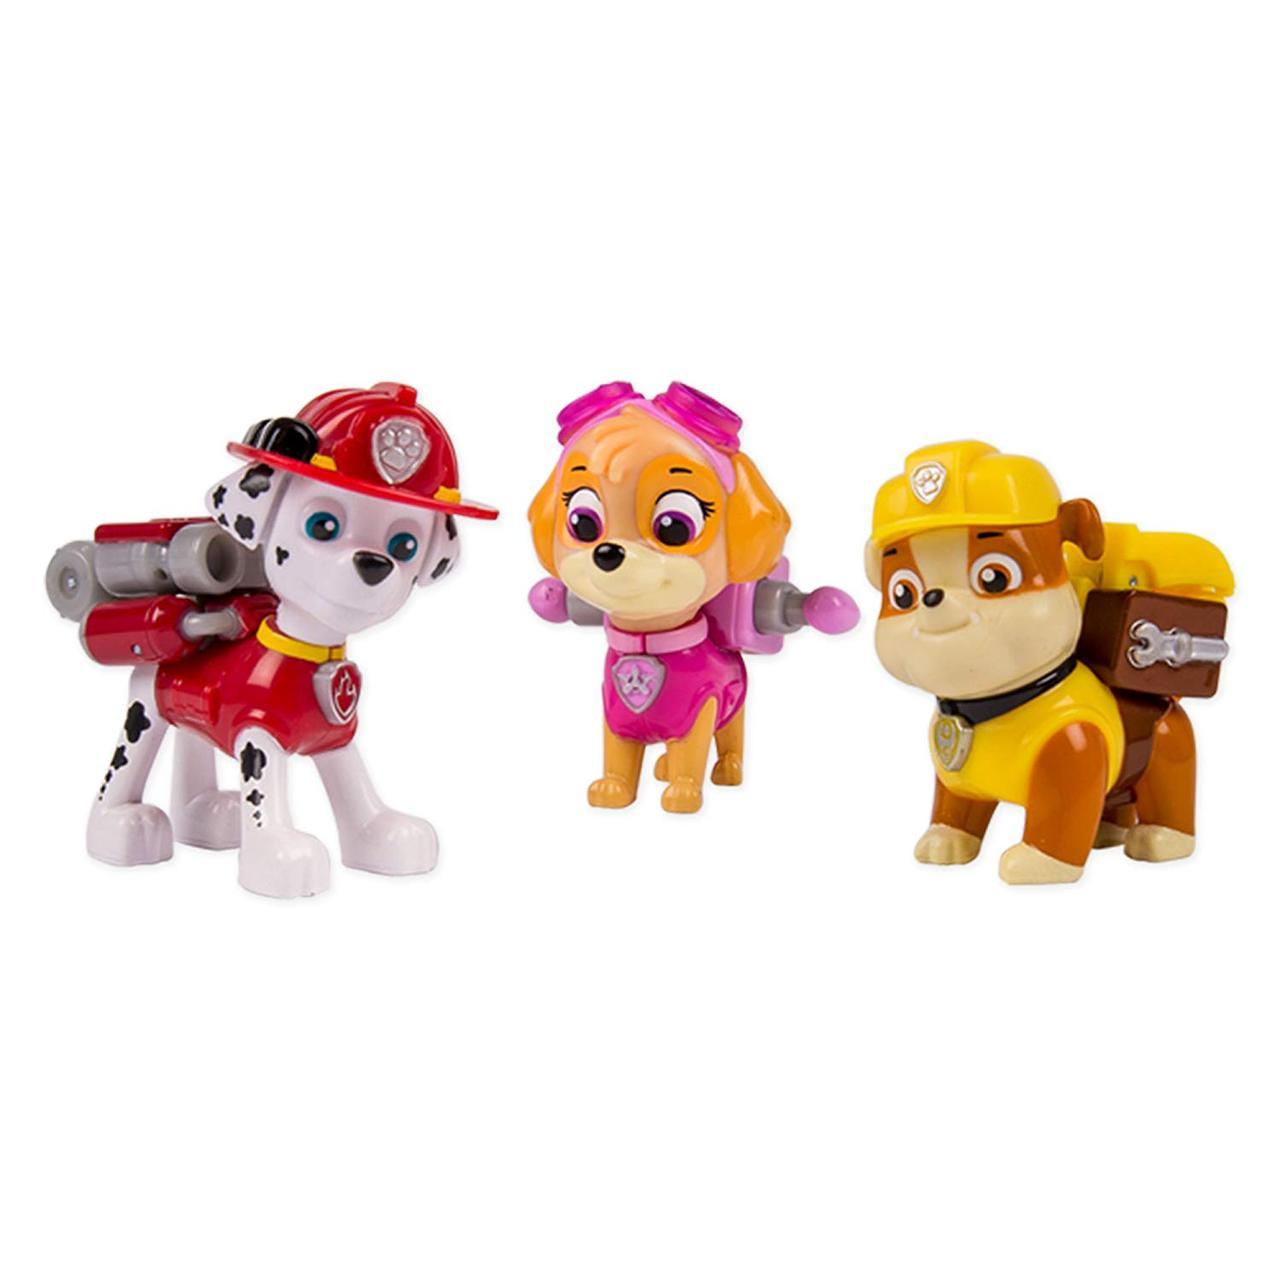 Игрушка Щенячий патруль Маршал, Скай, Крепыш Paw Patrol Action Pack Pups 3pk Figure Set Marshal, Skye, Rubble